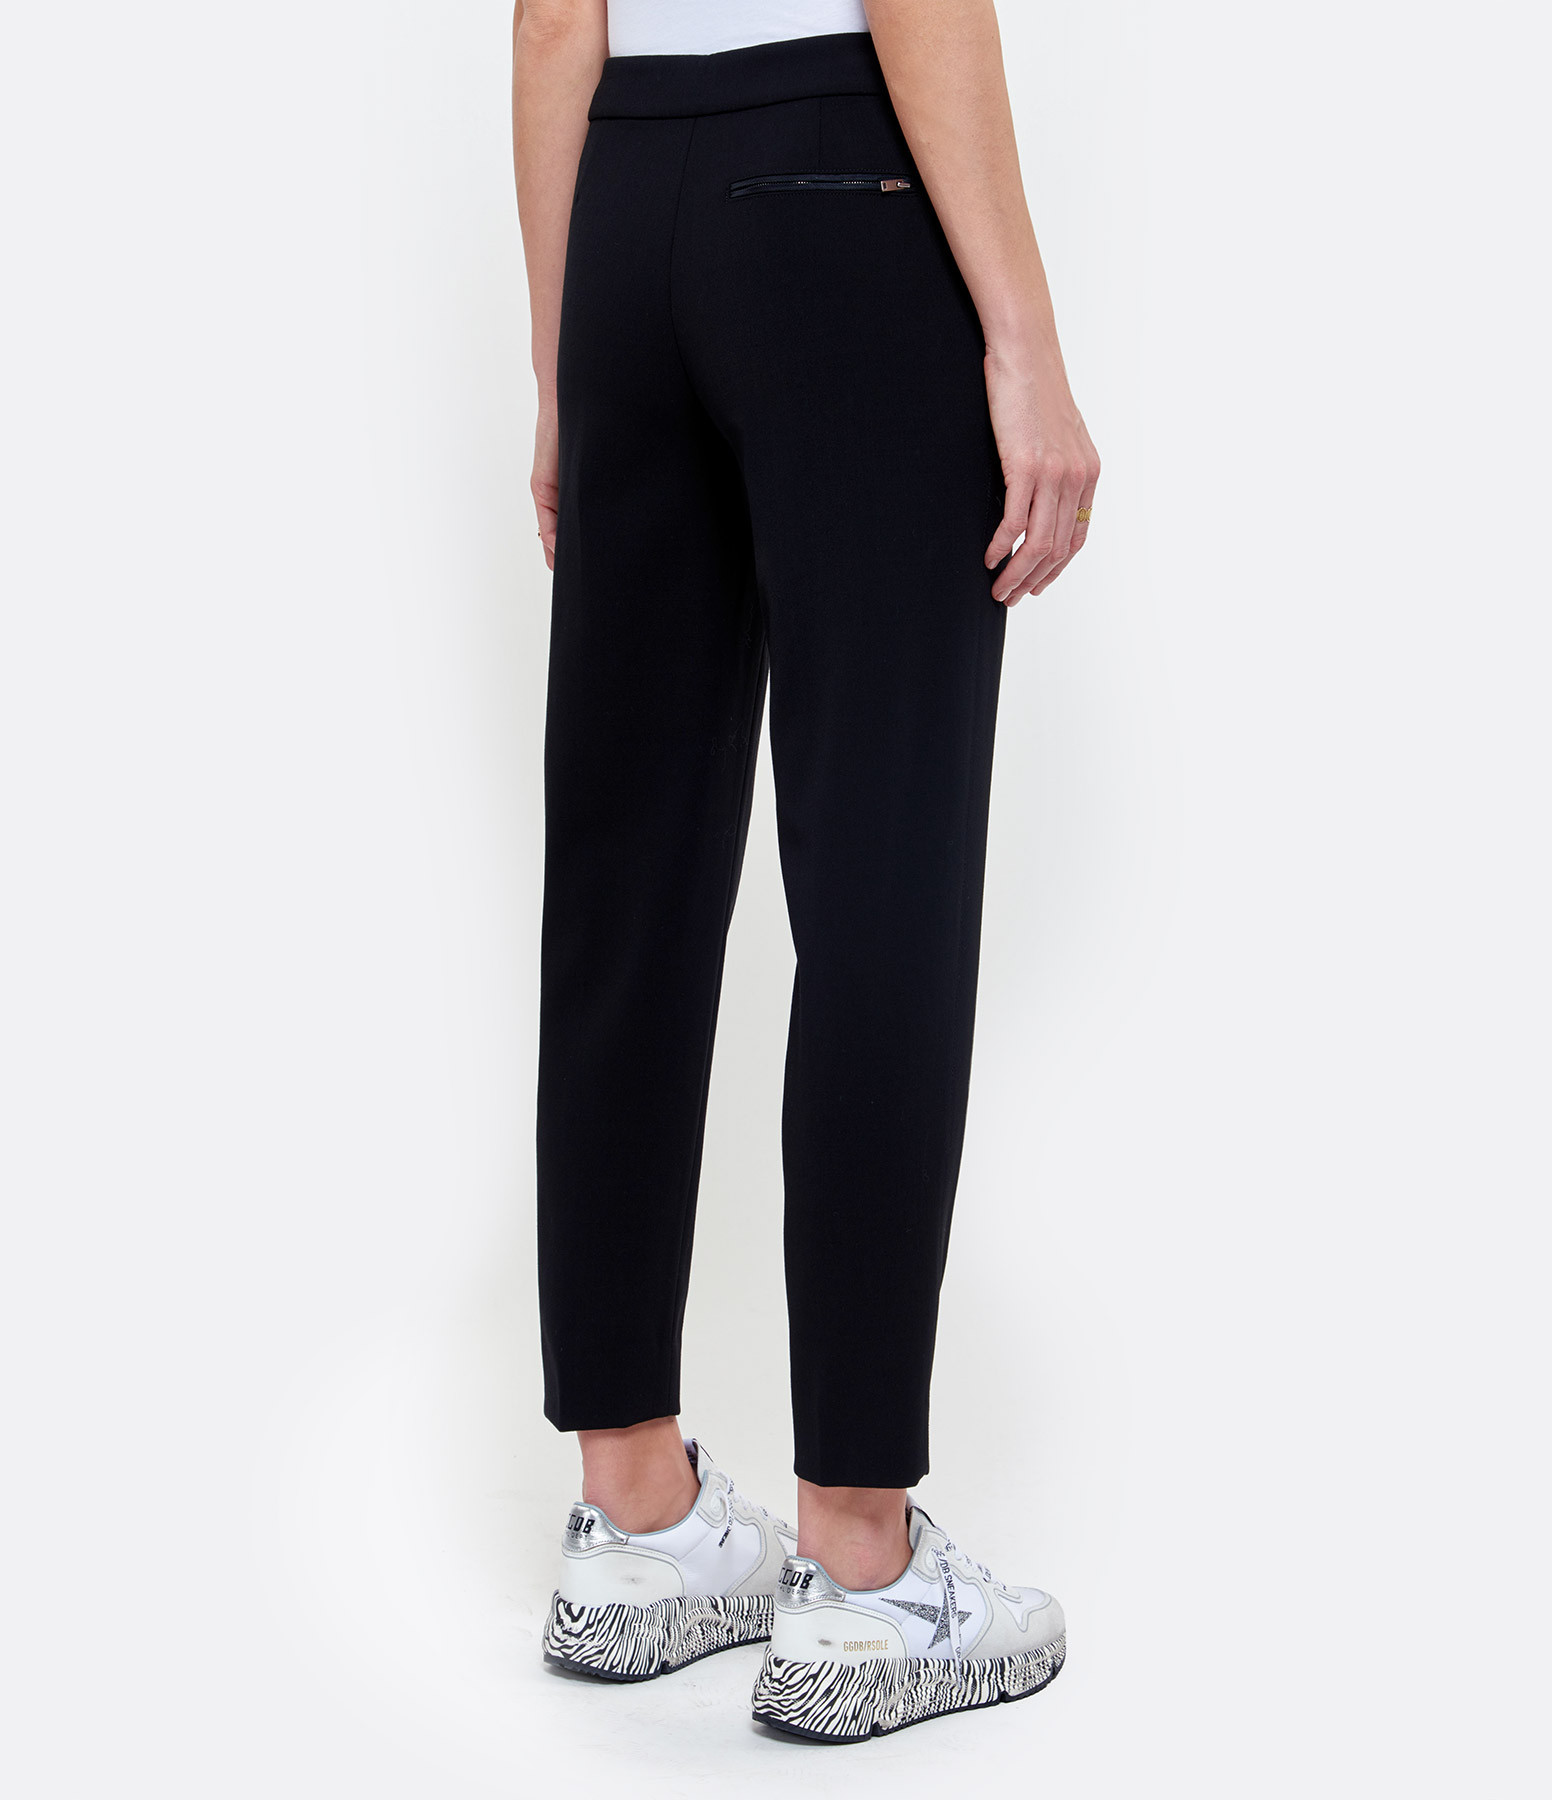 THEORY - Pantalon Carotte Laine Noir